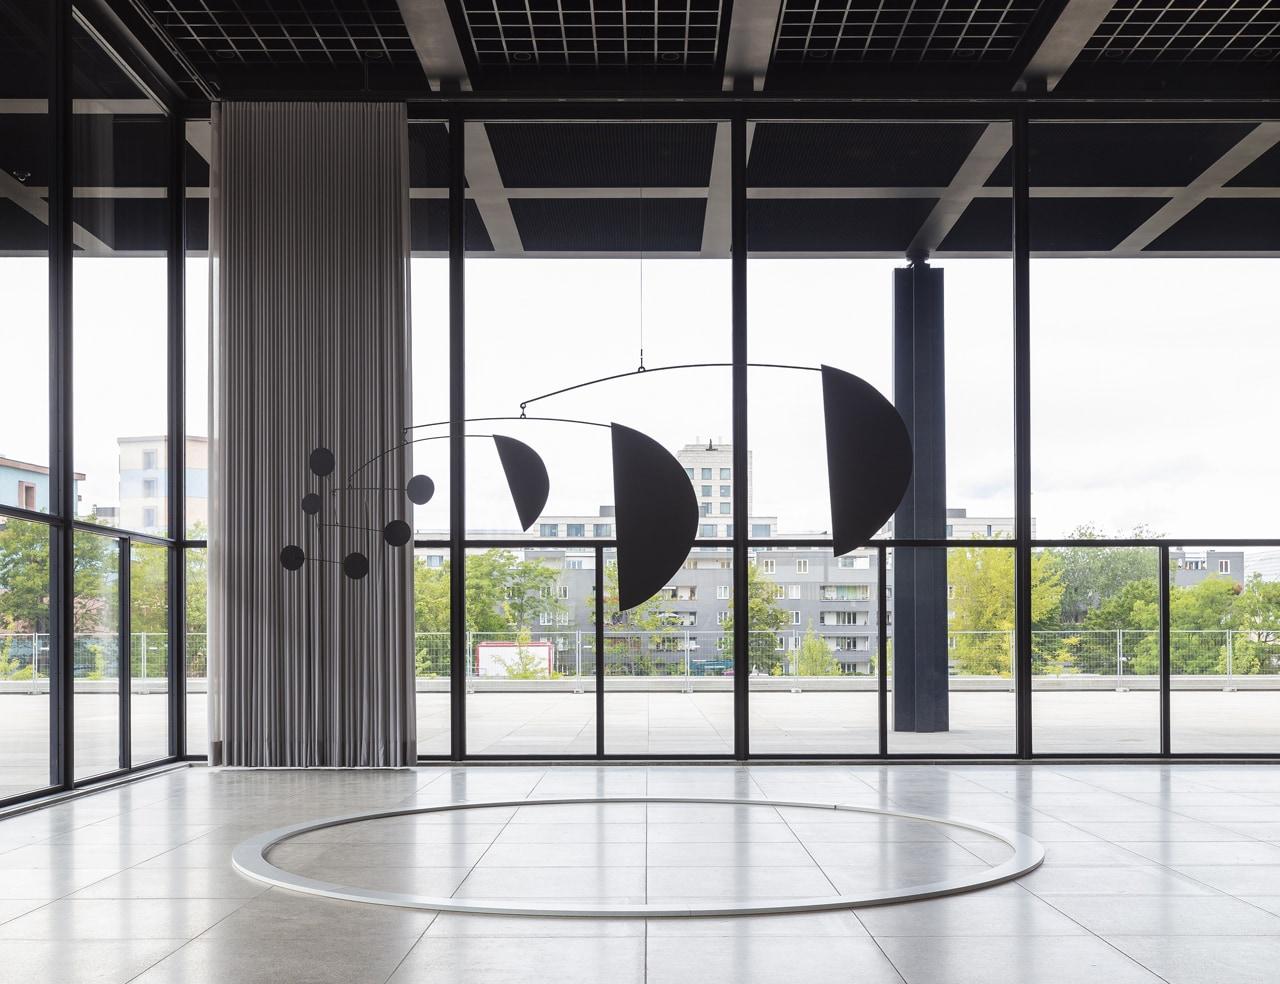 Alexander Calder, 3 Segments, 1973. Blech, Sheet metal, rod, wire. Calder Foundation, New York. © 2021 Calder Foundation, New York / Artists Rights Society (ARS), New York. VG-Bildkunst Bonn, 2021 / Photo by David von Becker